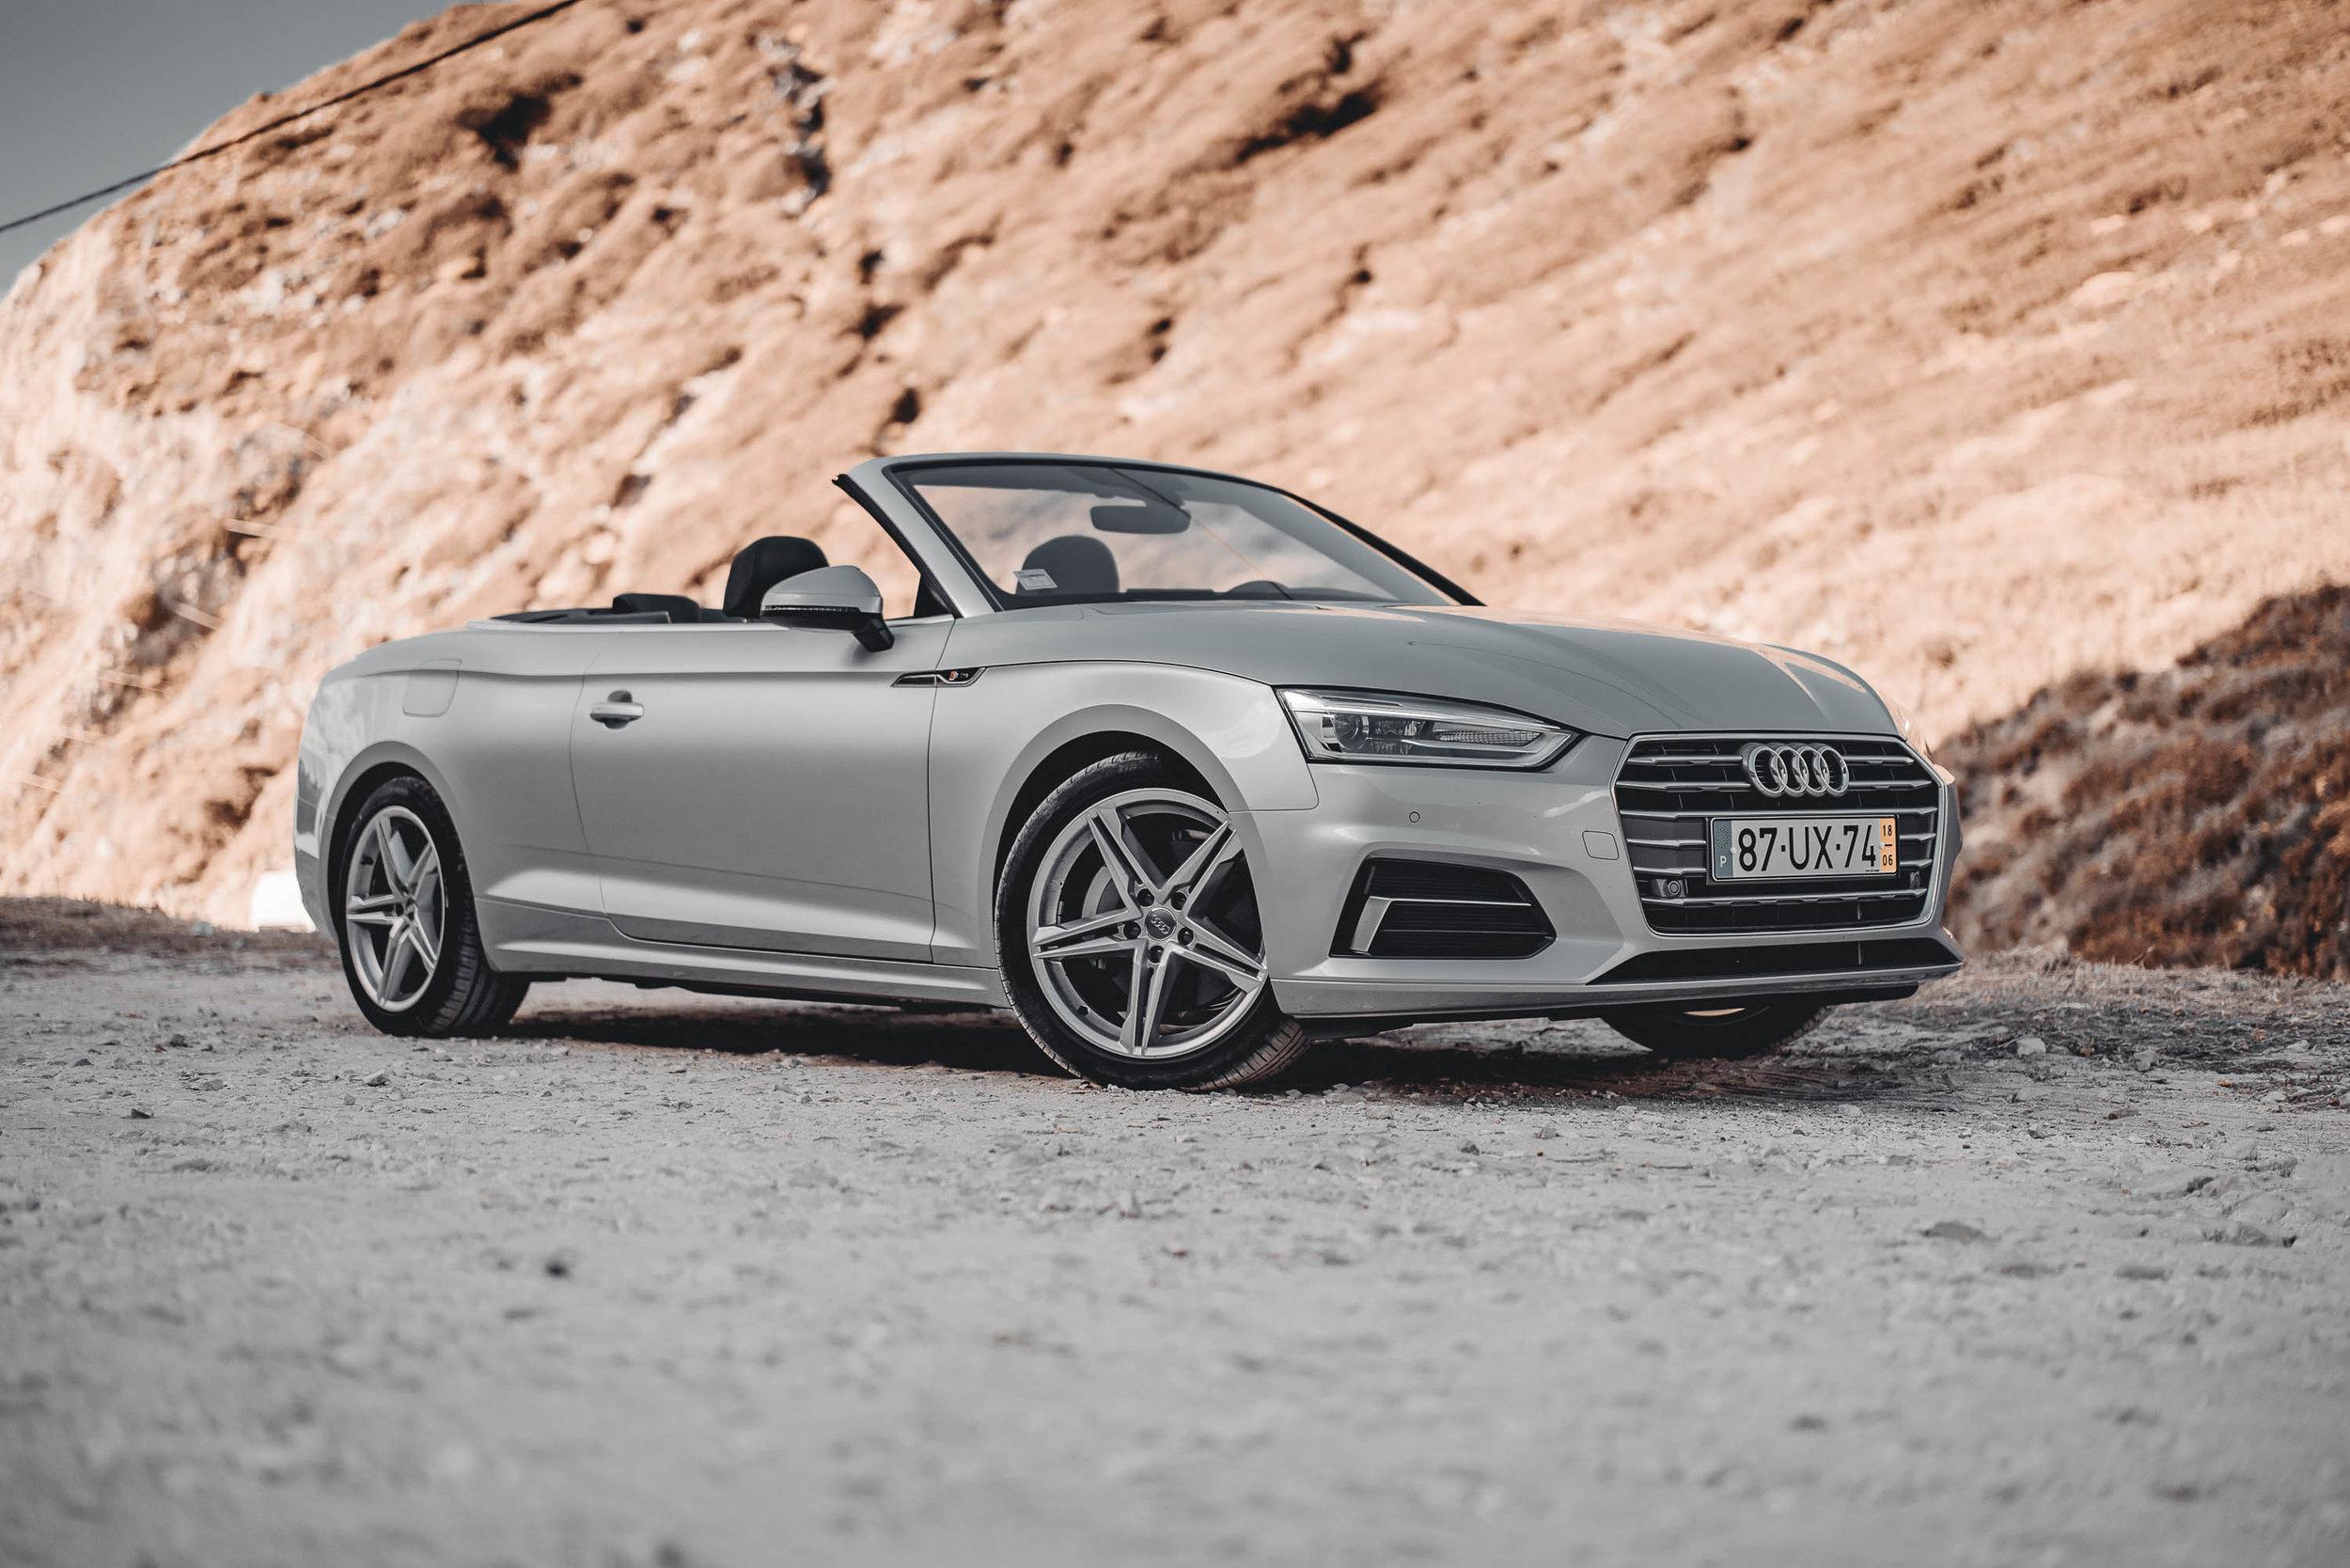 Maximilian_Otto_Audi_A5_Cabriolet_Portugal_11_WEB.jpg